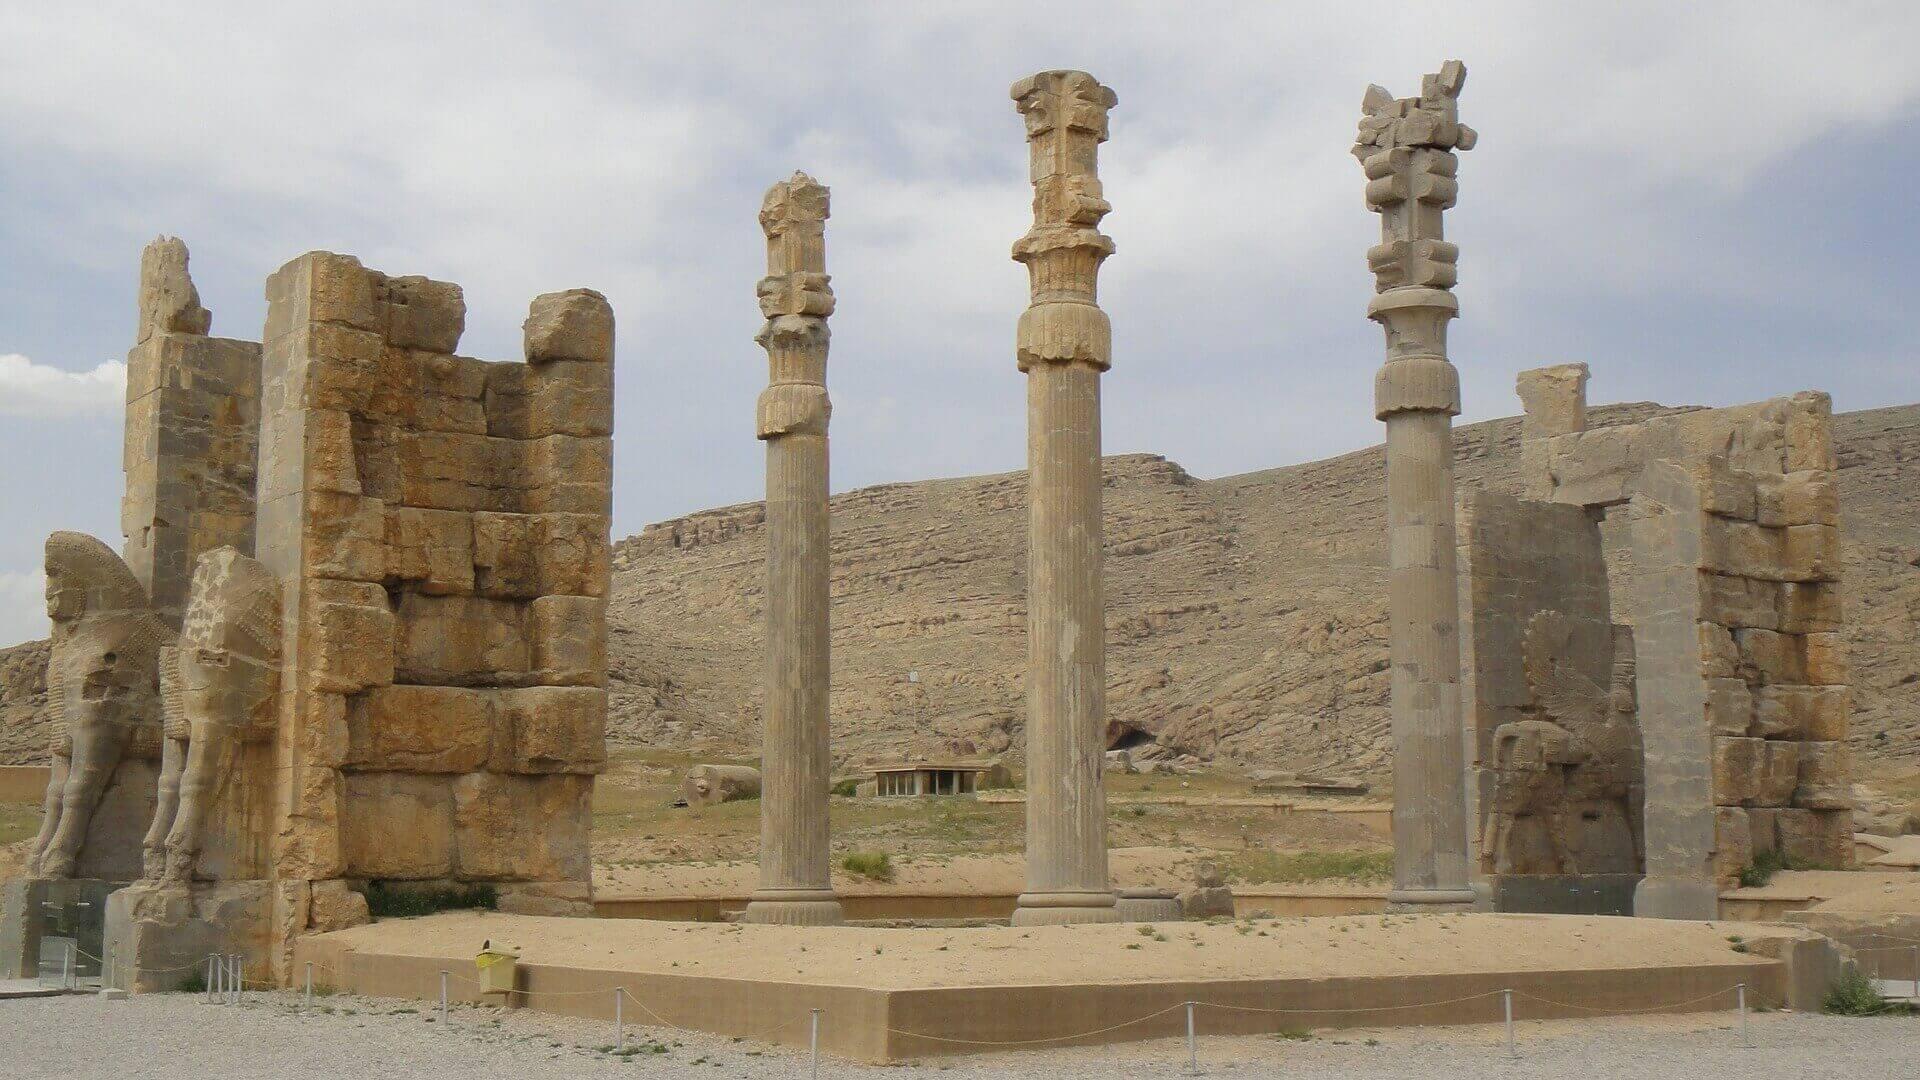 Oude pilaren in Persepolis in Iran